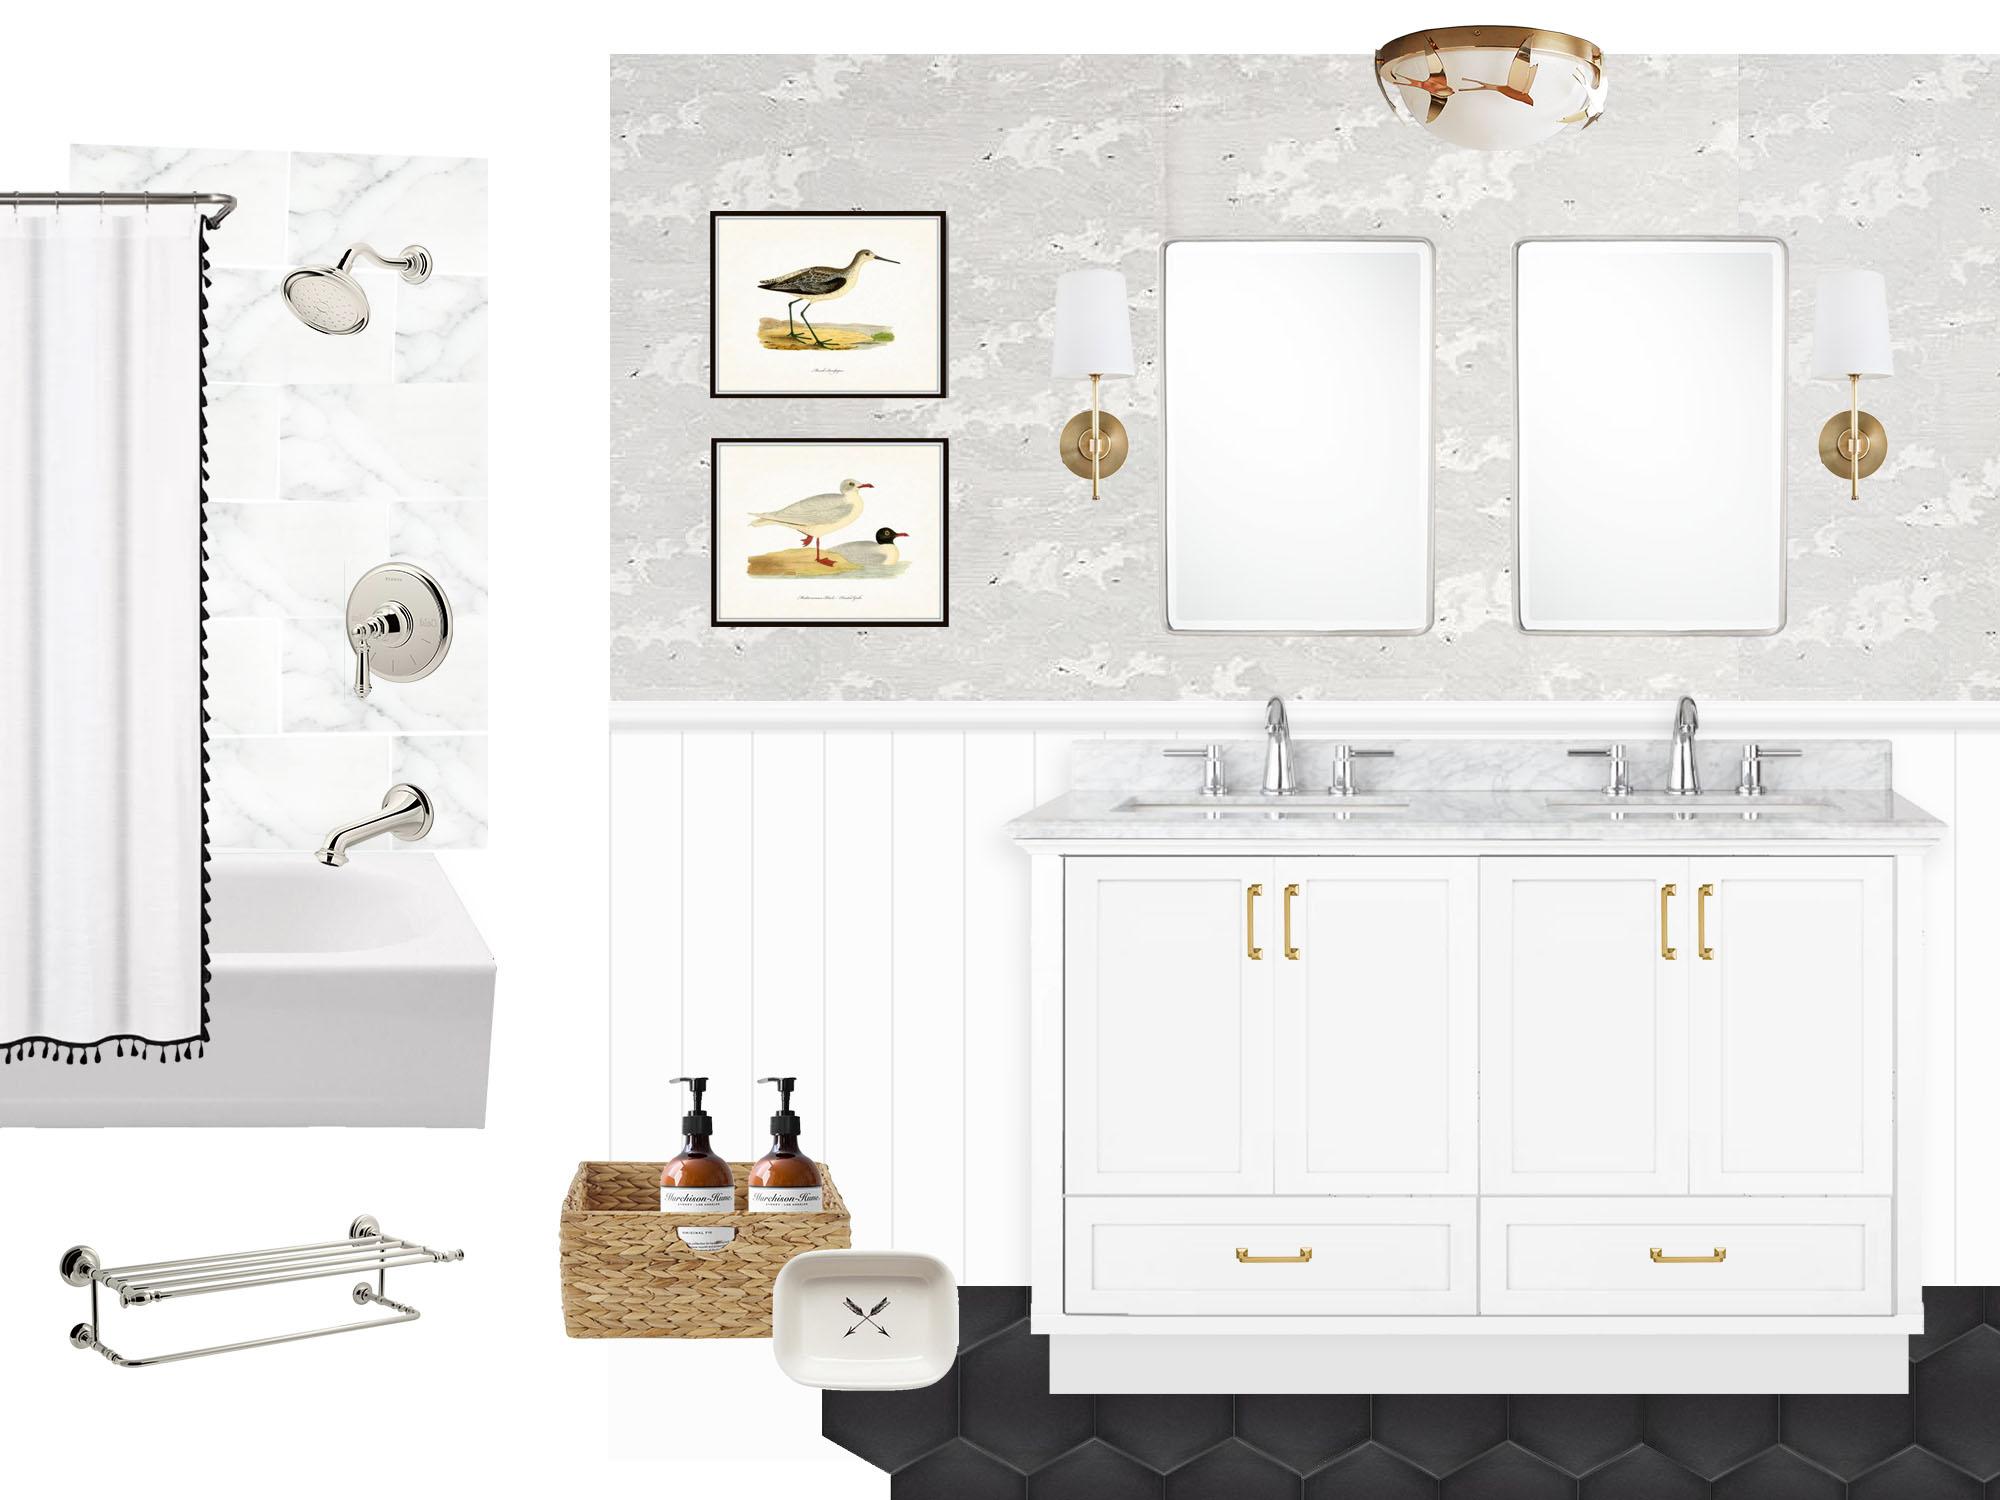 master bathroom remodel inspirations, mood board, moodboard